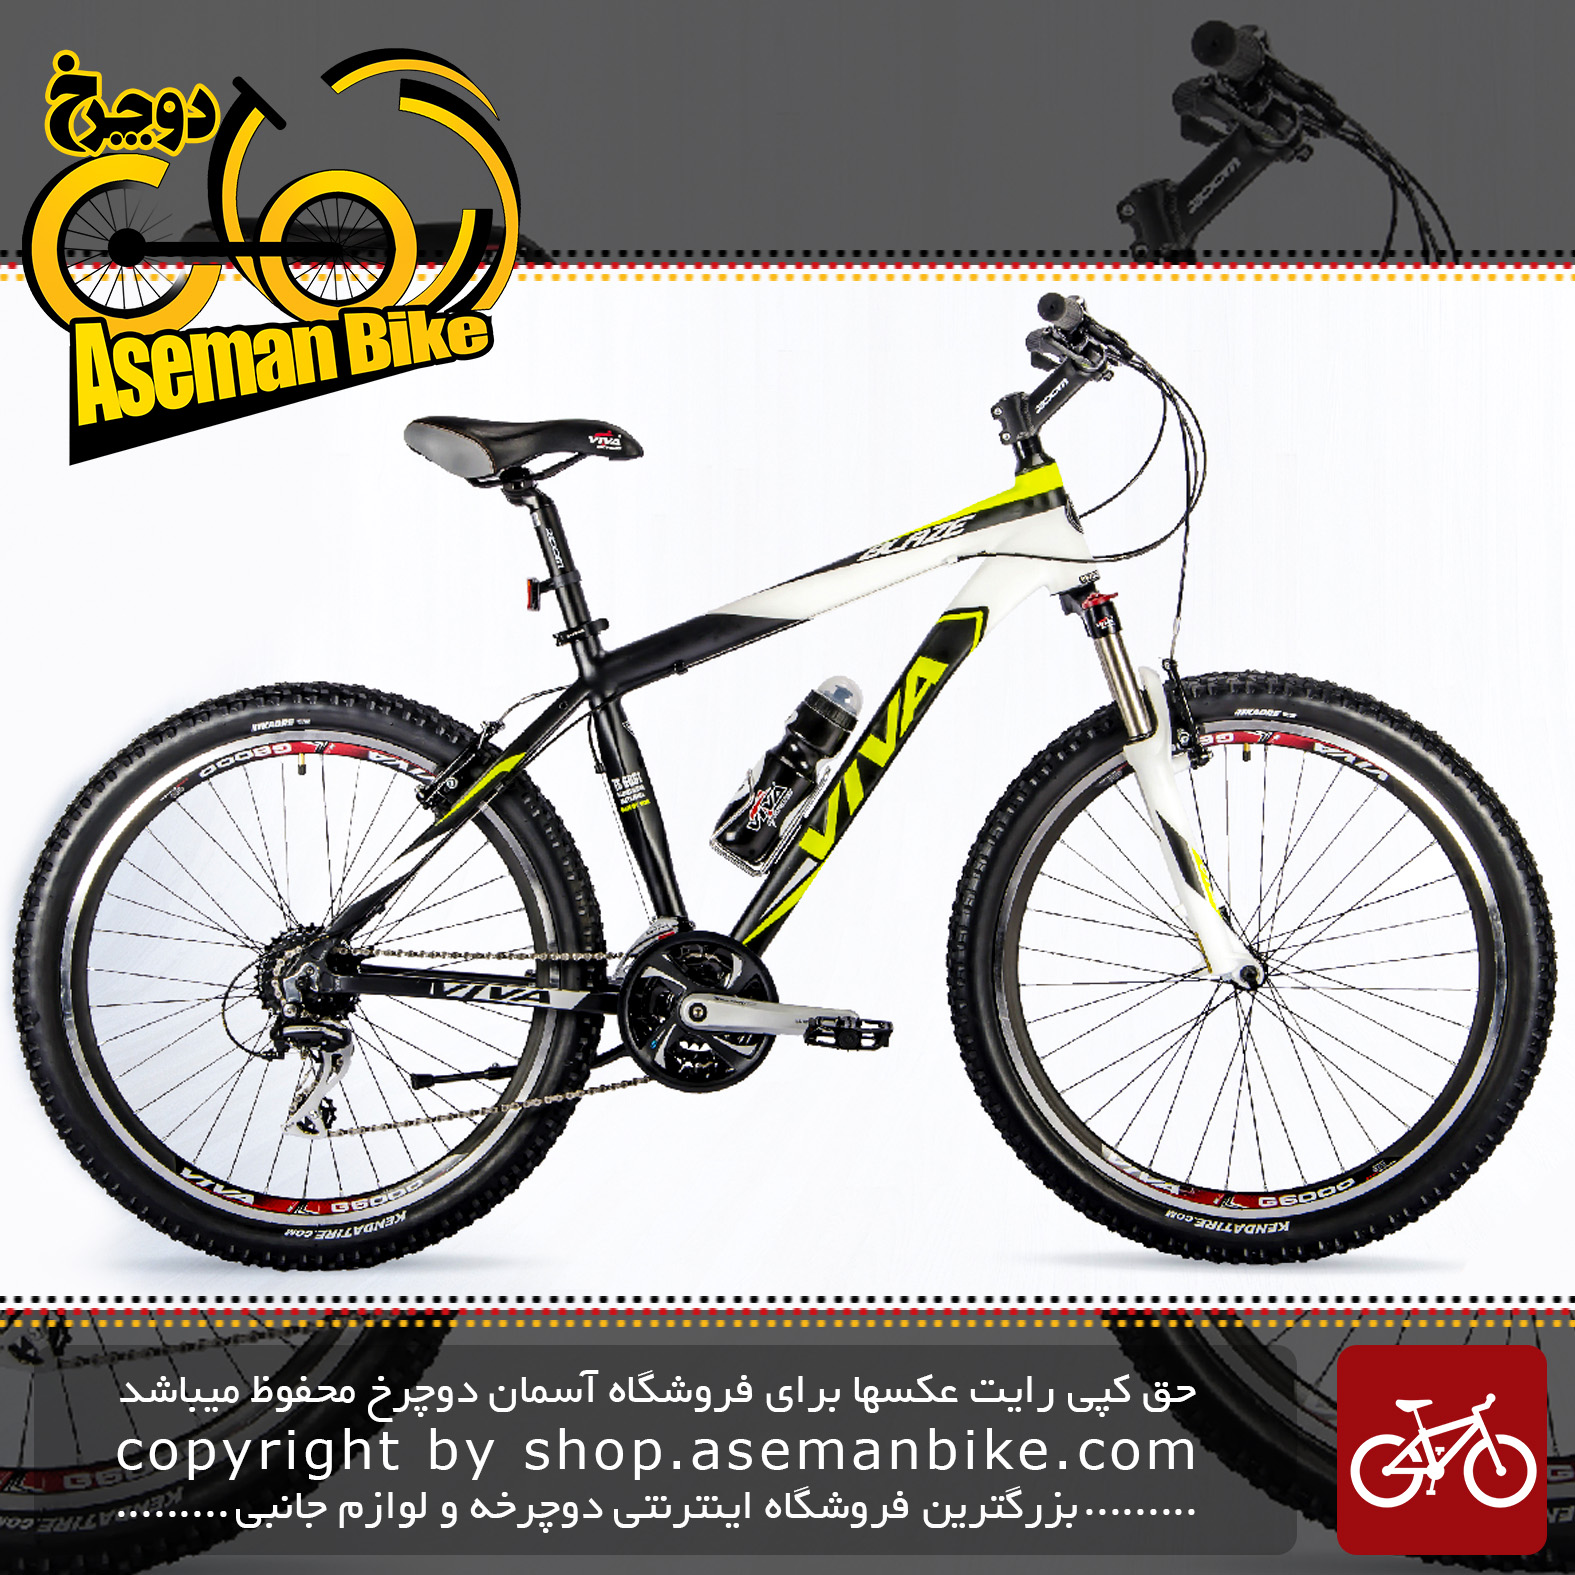 دوچرخه کوهستان شهری ویوا مدل بلیز 24 دنده سایز 26 ساخت تایوان Viva Mountain City Bicycle BLAZE 18 26 2018 Made In Taiwan